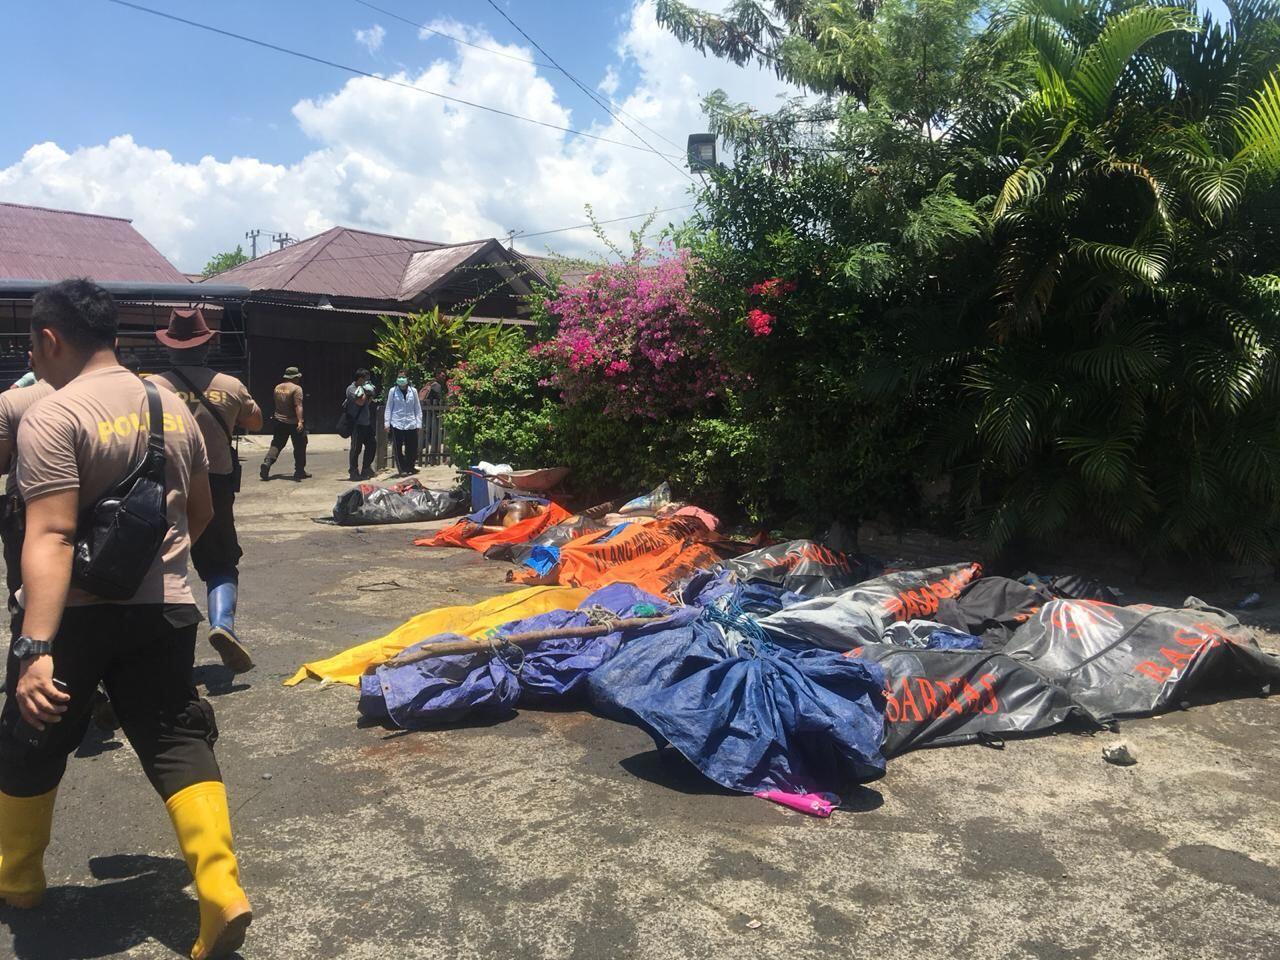 BNPB: Evakuasi Korban Bencana Palu-Donggala Dihentikan 11 Oktober